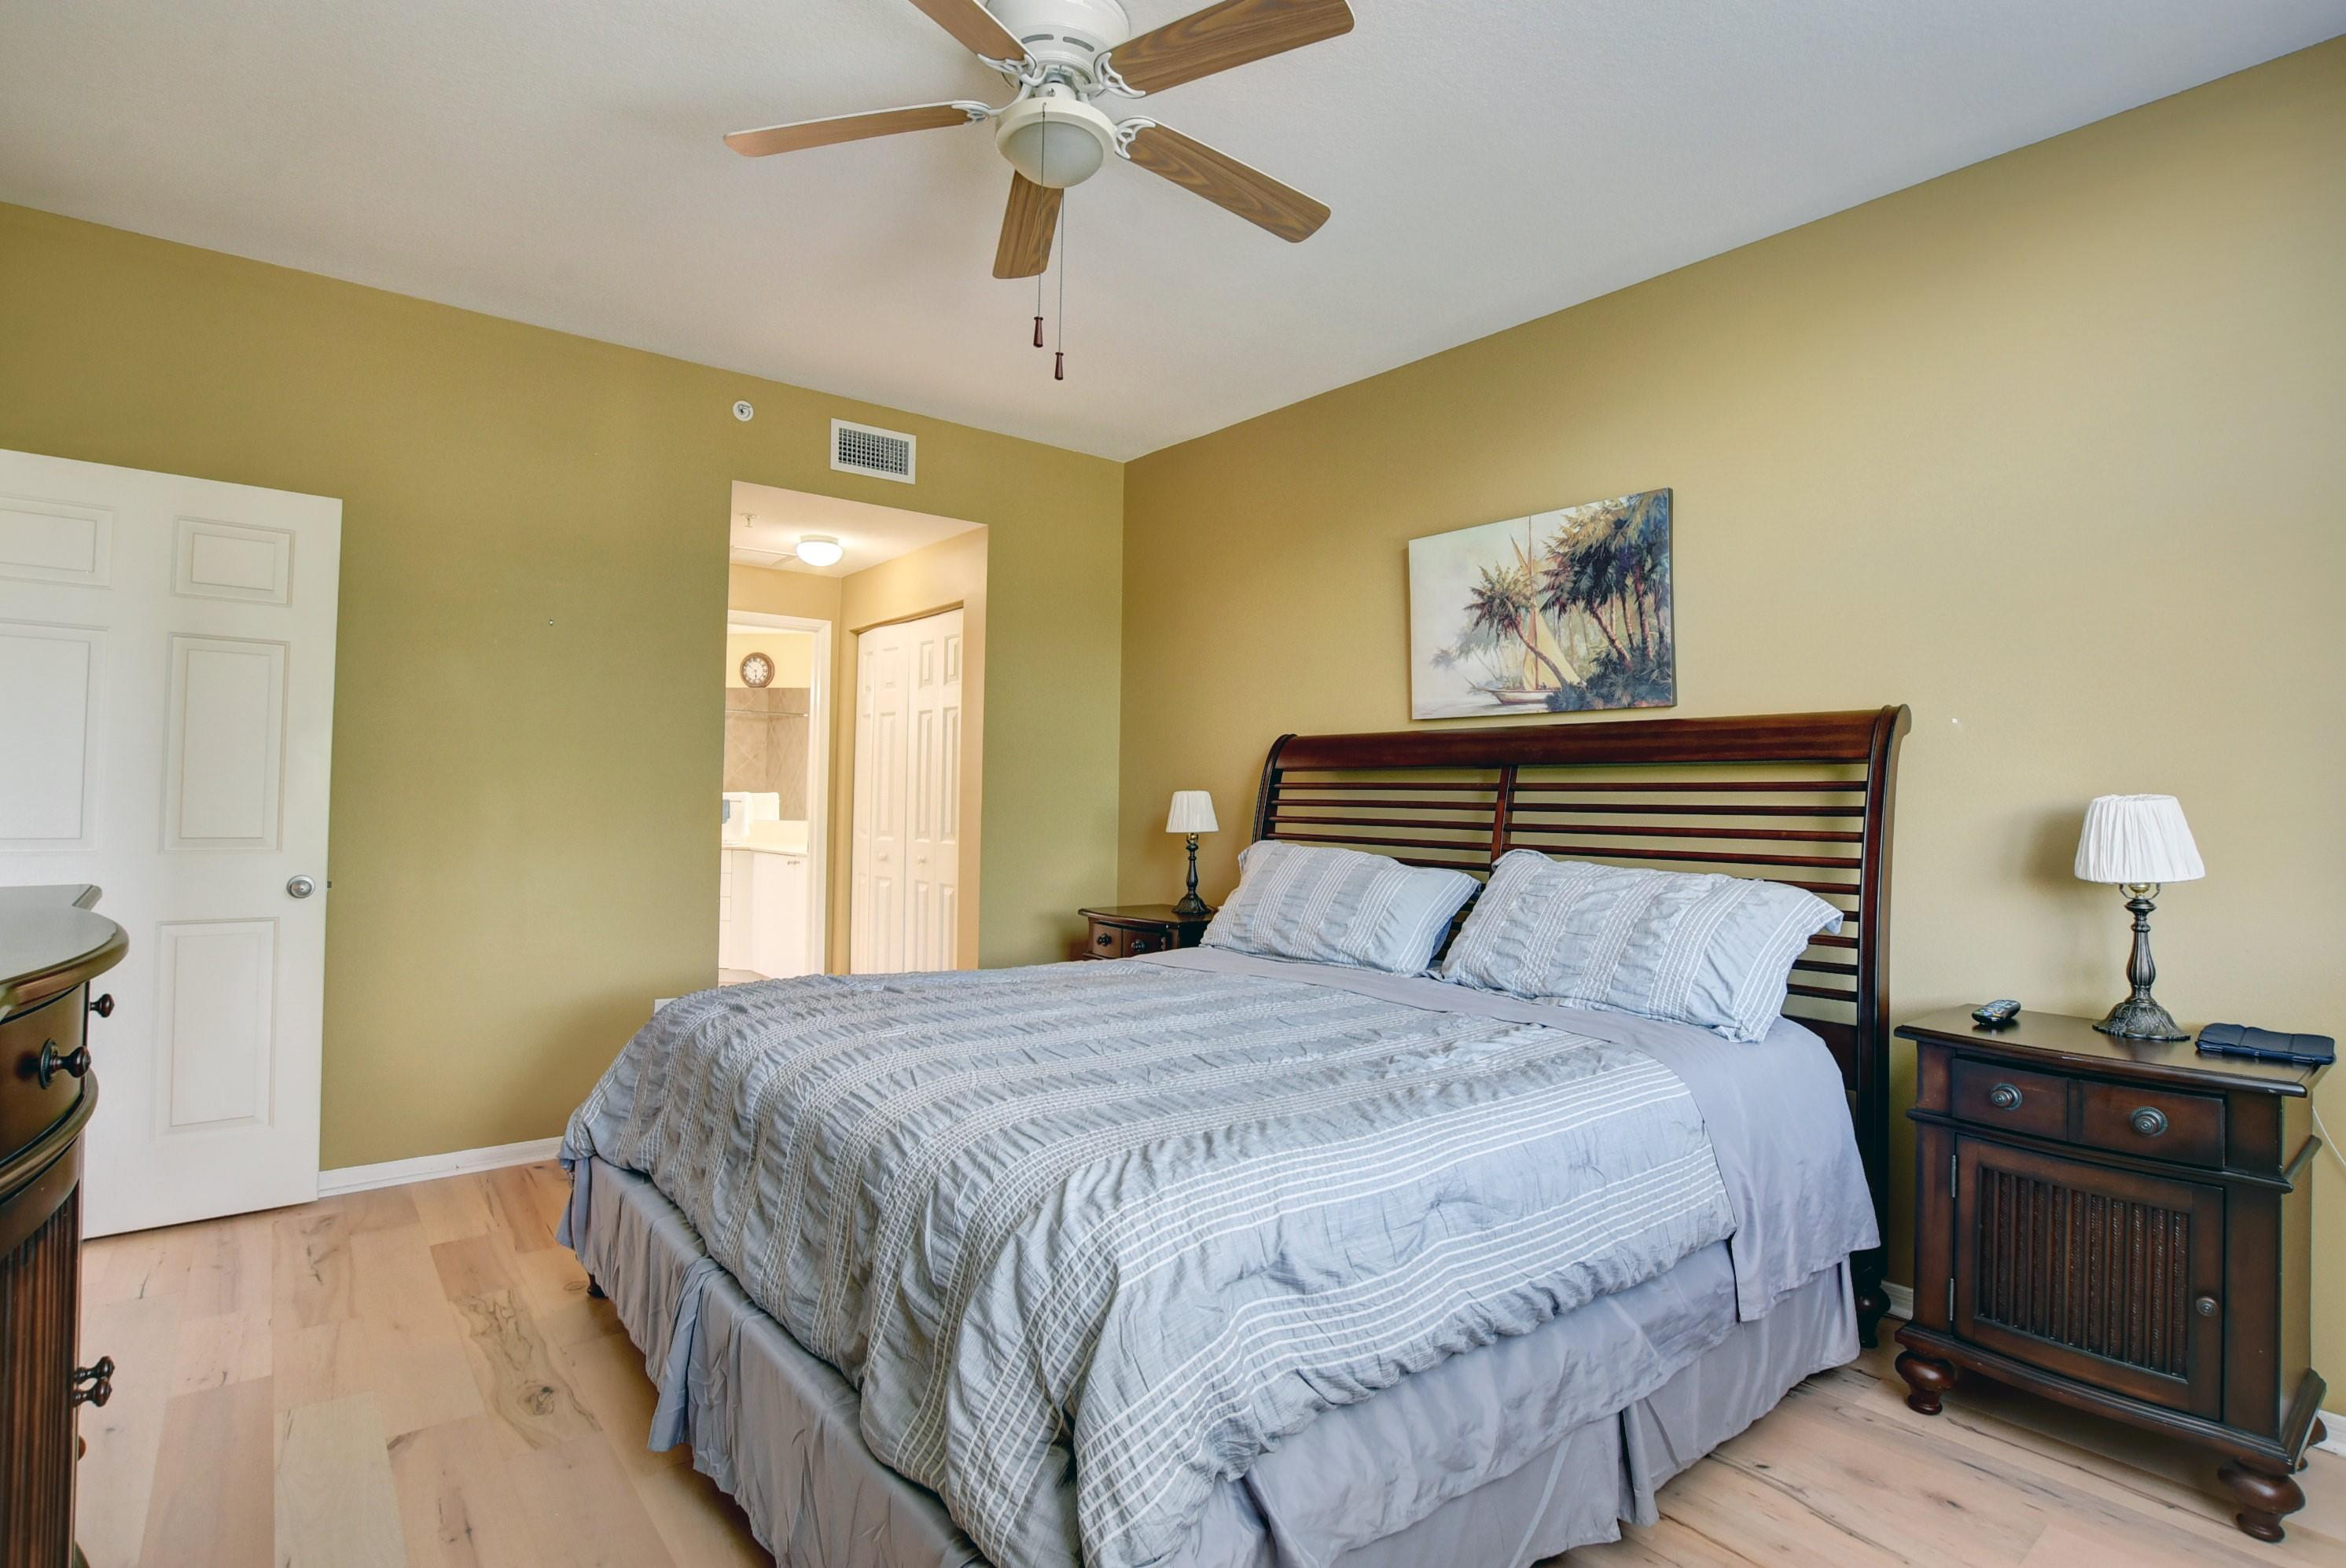 1.1 Master bedroom